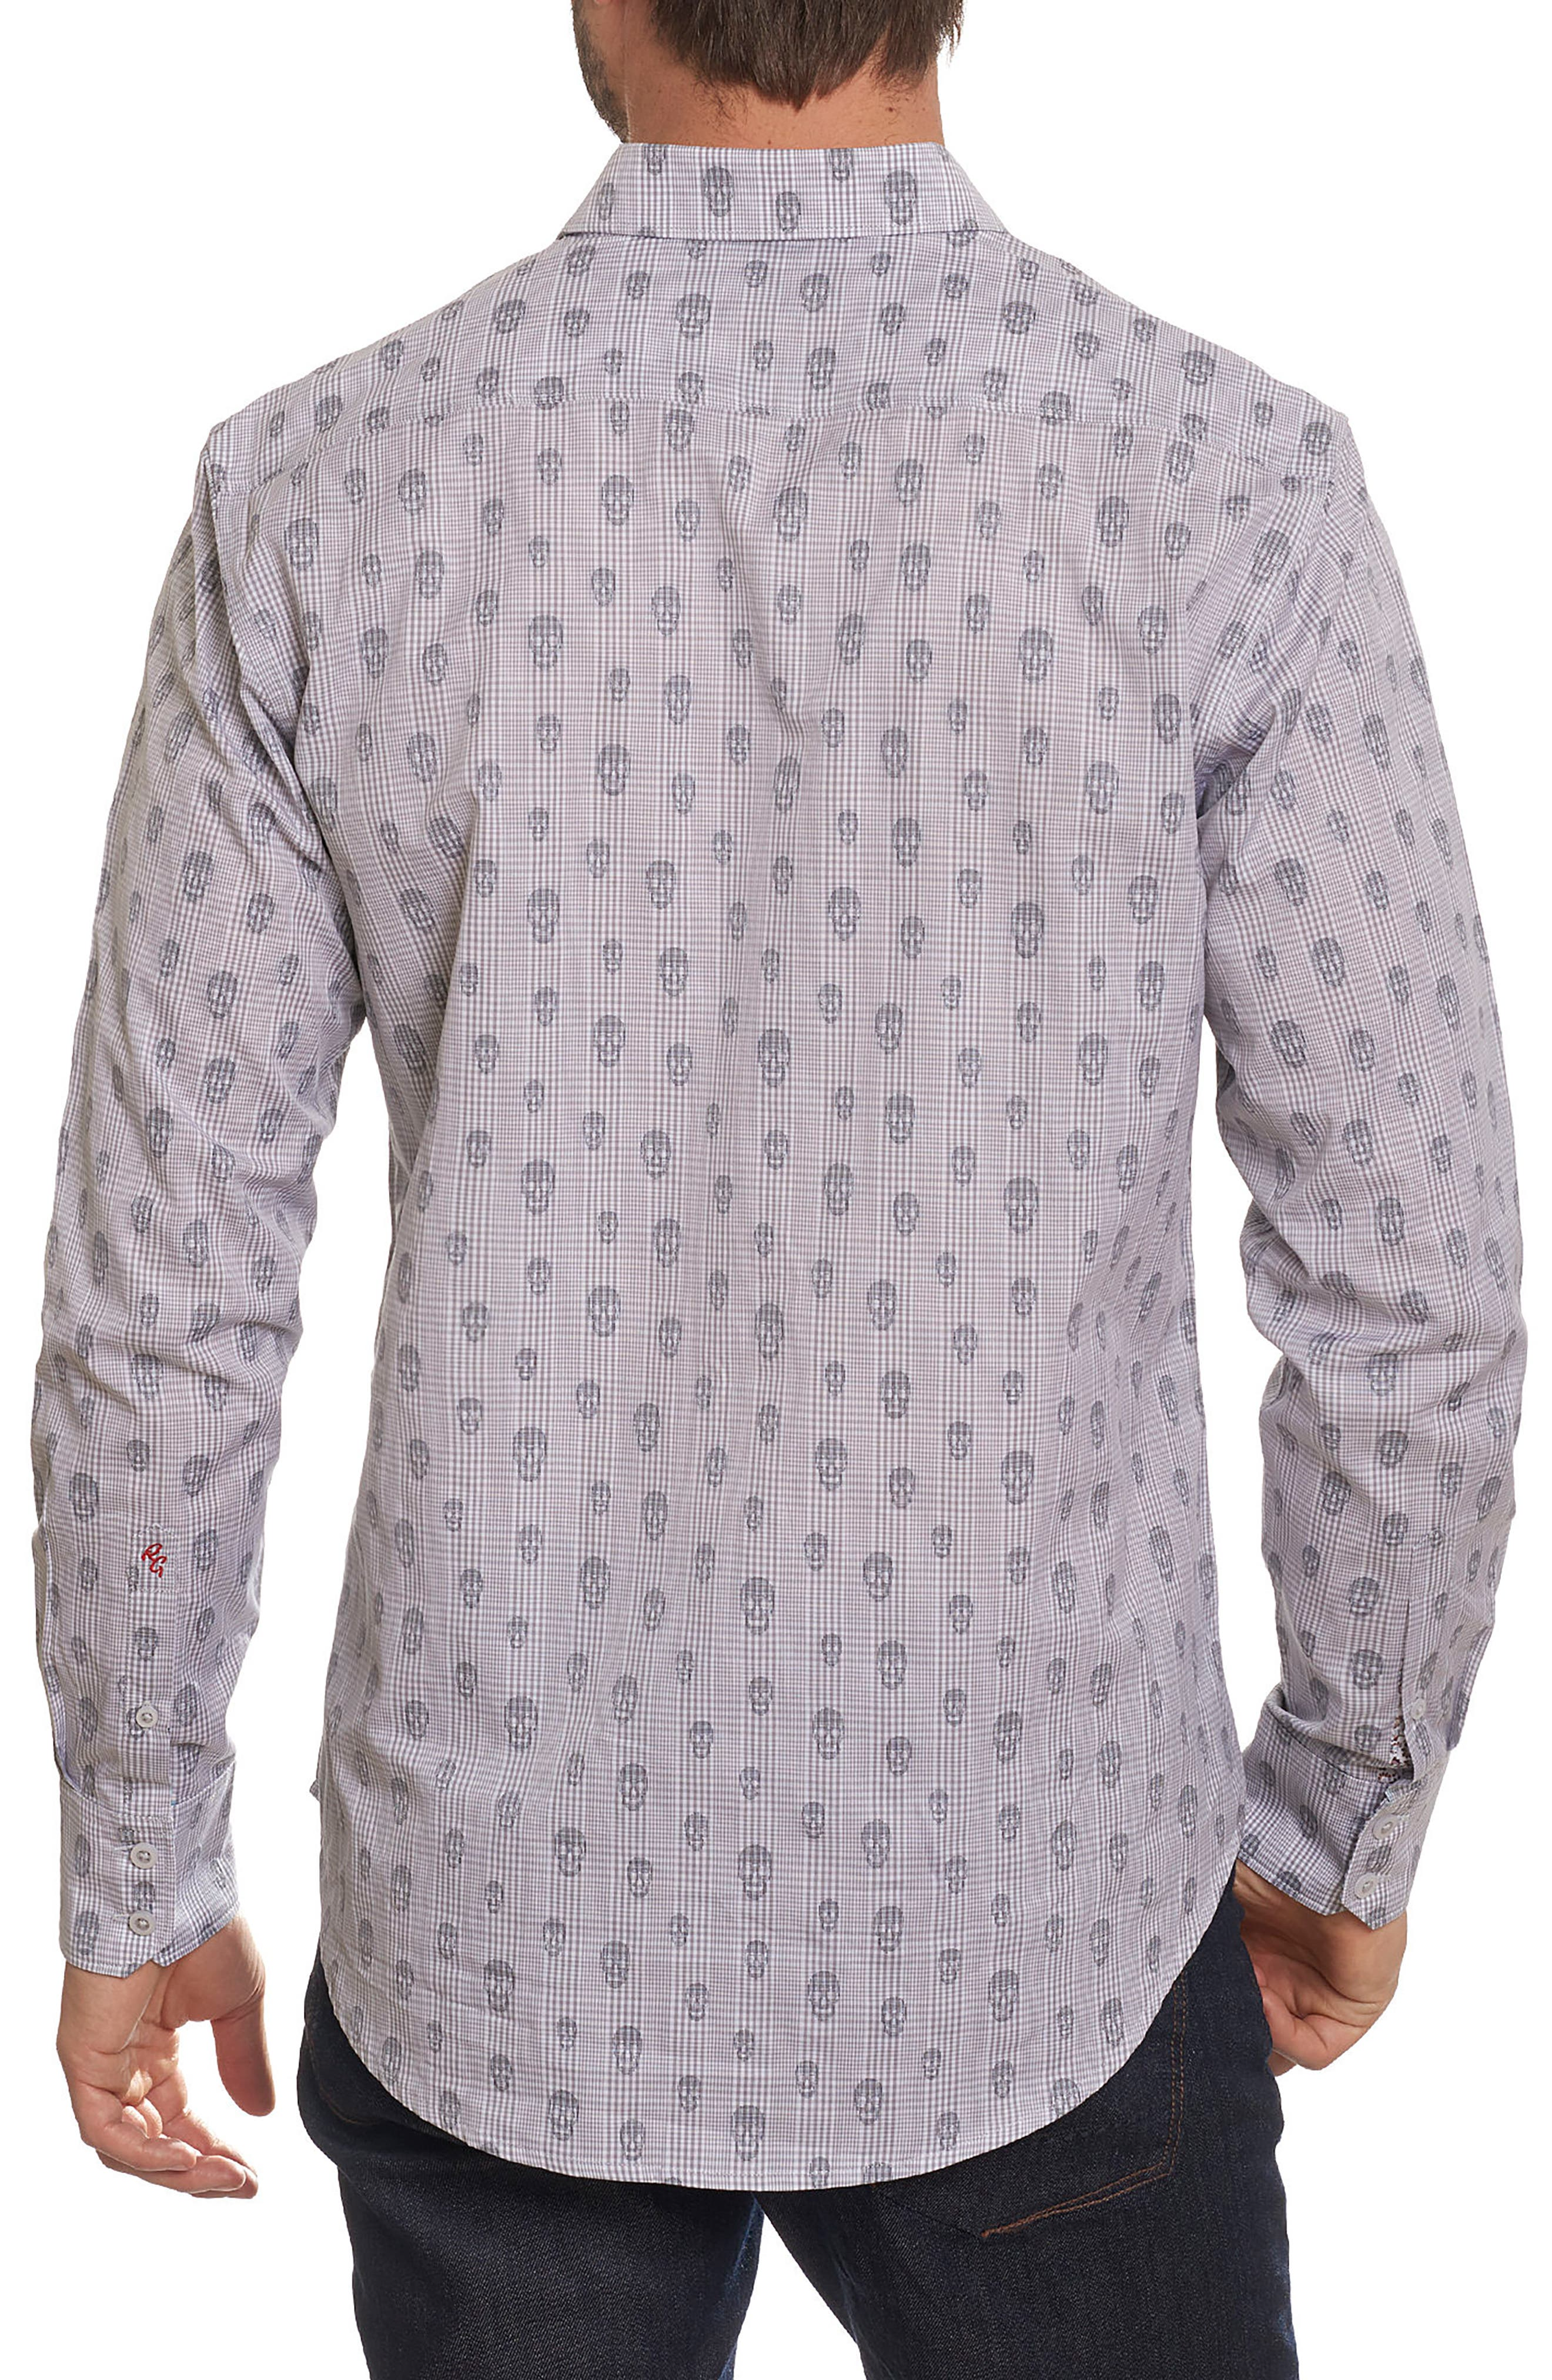 Kinderhook Classic Fit Skull Check Sport Shirt,                             Alternate thumbnail 2, color,                             020